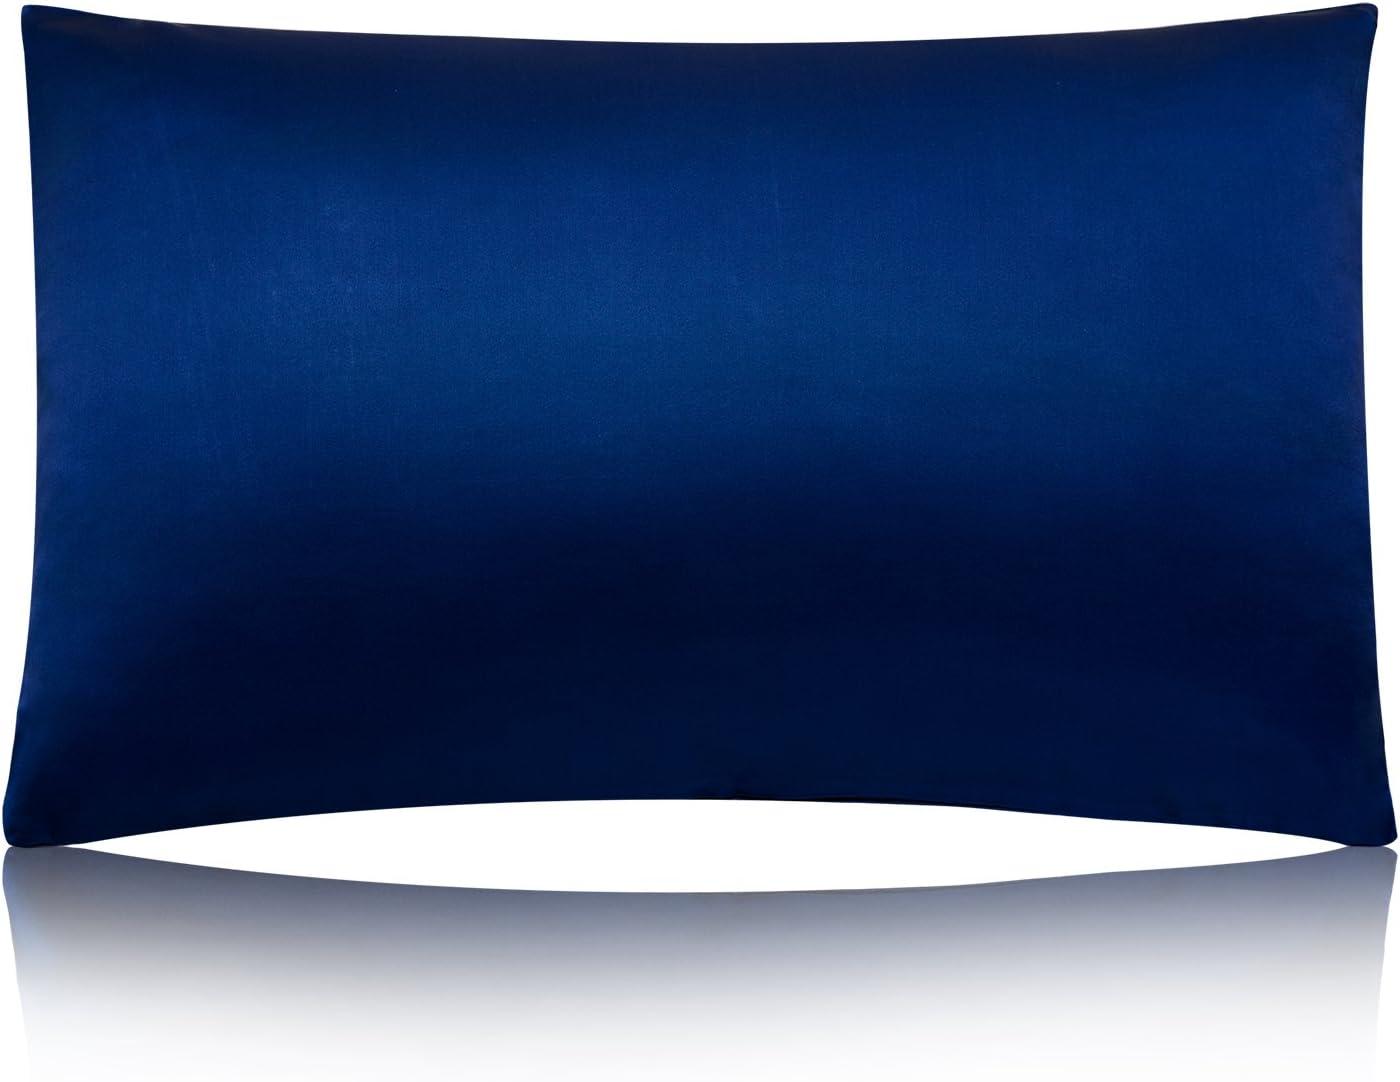 Amazon Com Meilis 100 Pure Silk Satin Pillowcase For Baby Travel Sized Pillows Hypoallergenic Pillow Shams Cover Royal Blue Kids Pillow Slip Home Kitchen